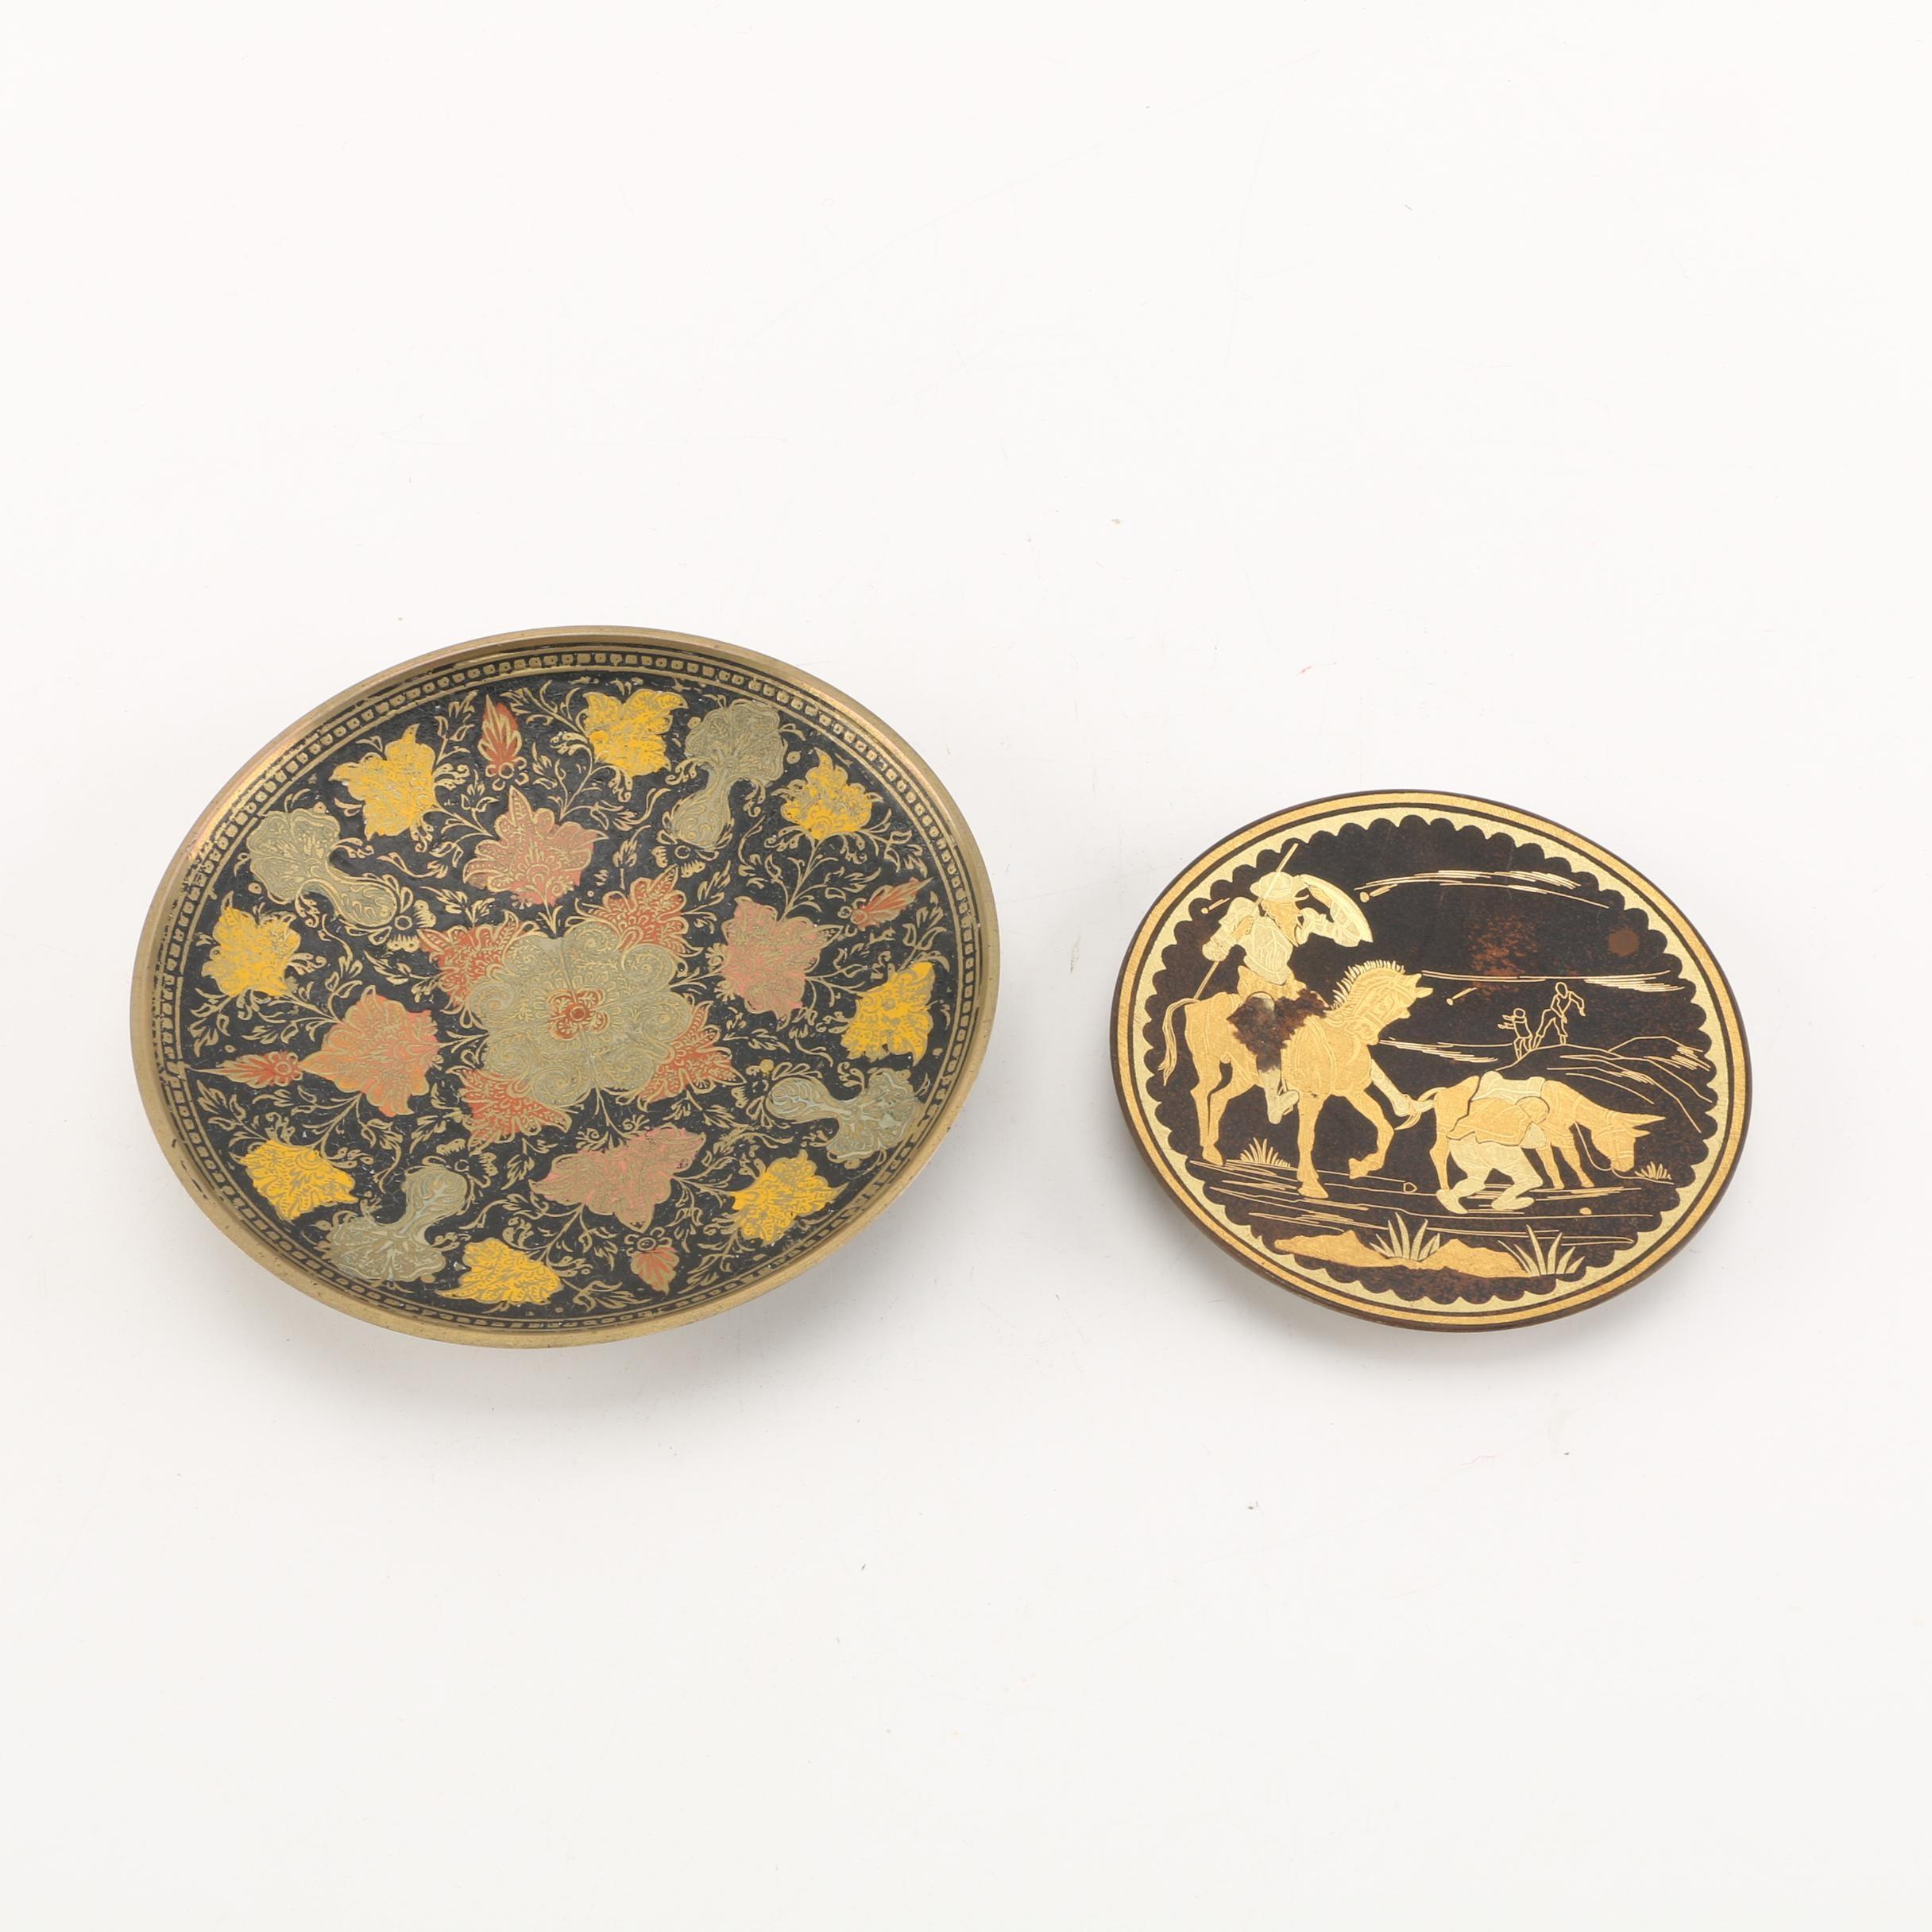 Damascene Decorative Plates Including Don Quixote Motif